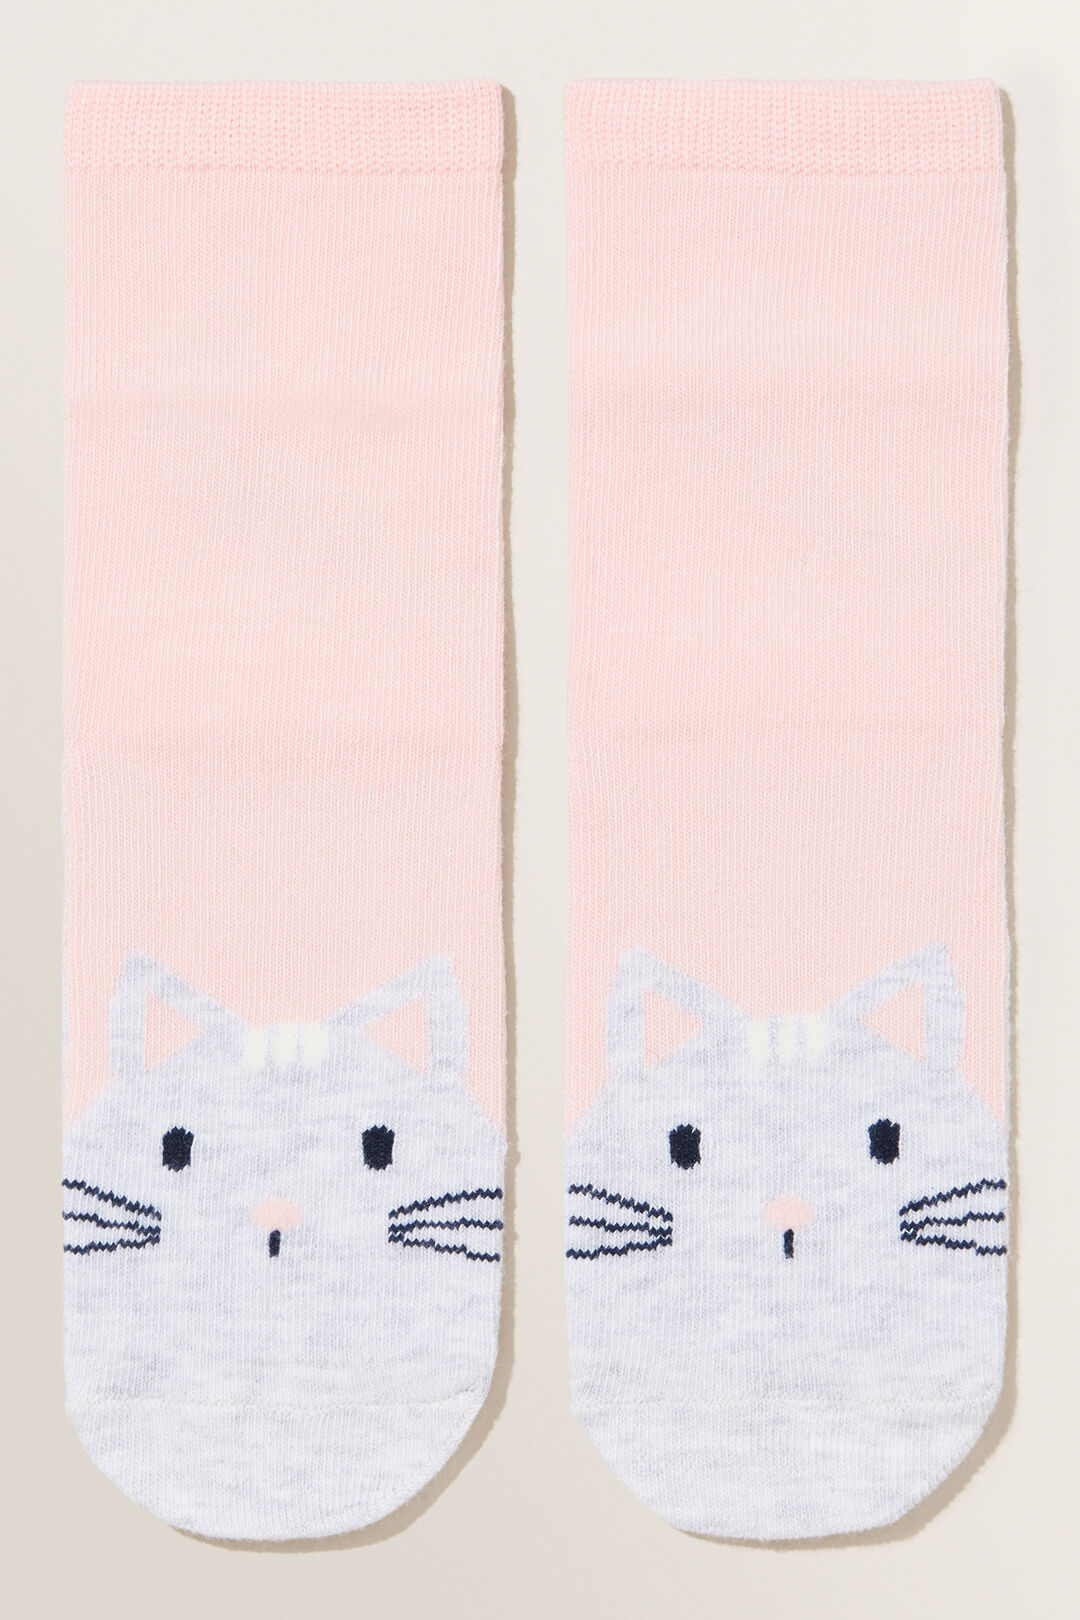 Kitty Socks  DUSTY ROSE  hi-res